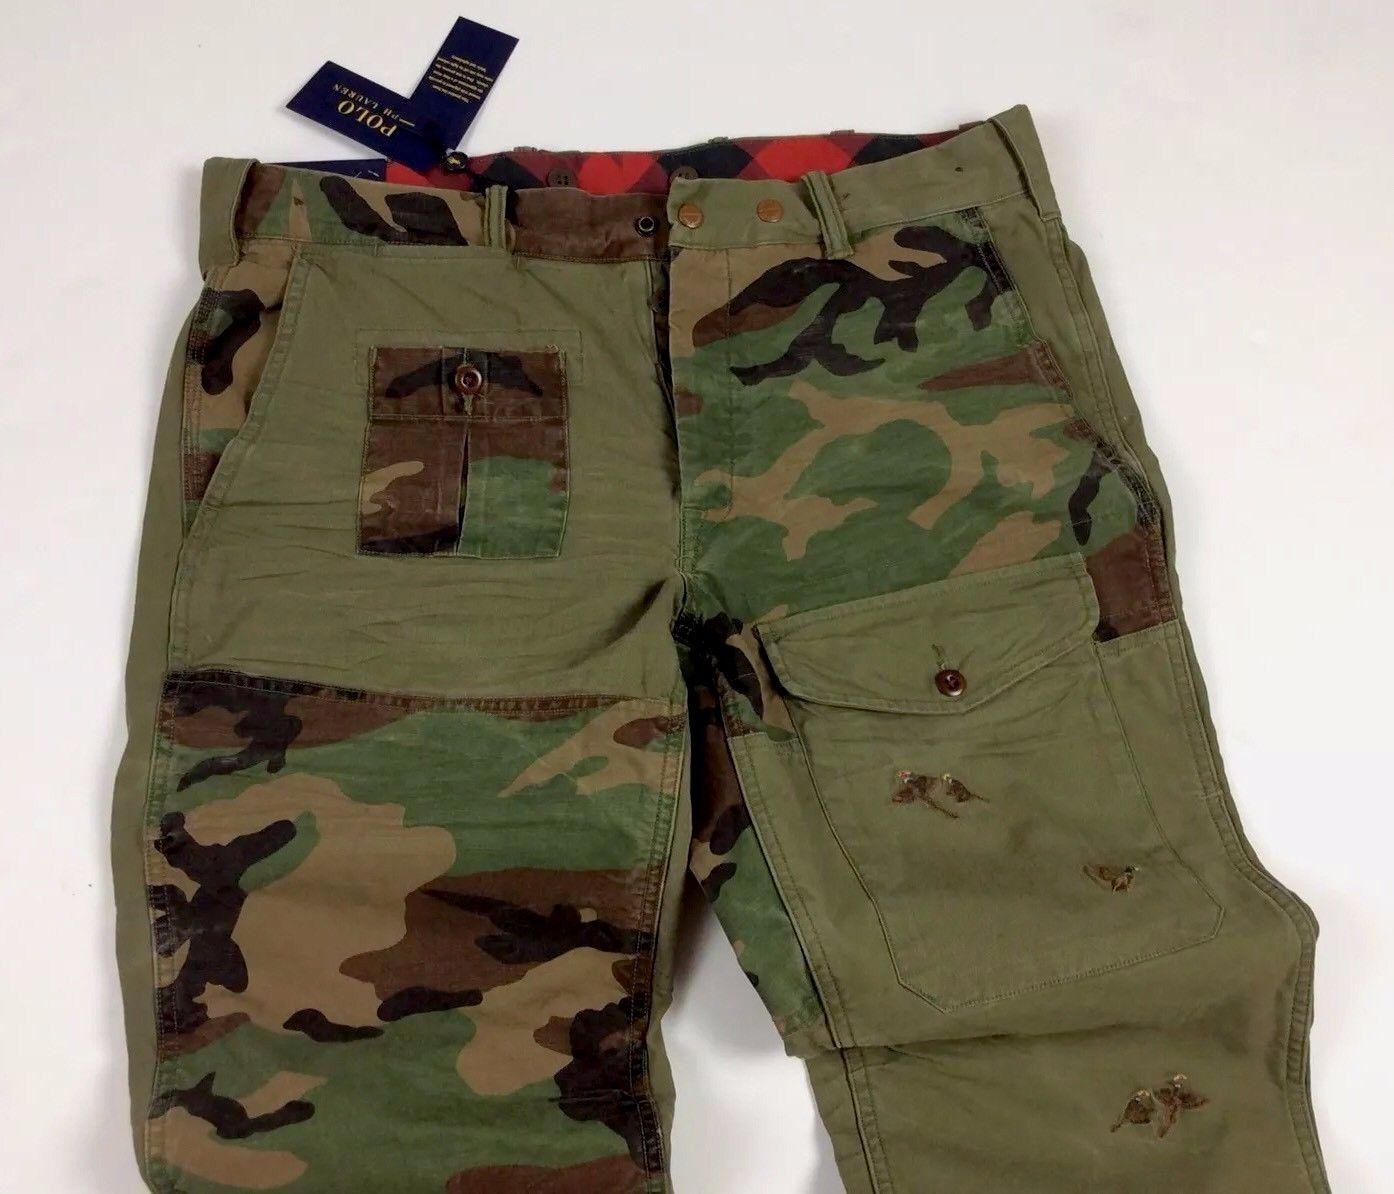 2ce79415a2 ... denmark polo ralph lauren men military army camo patchwork combat  surplus cargo pants ebay 8fc65 8edfe